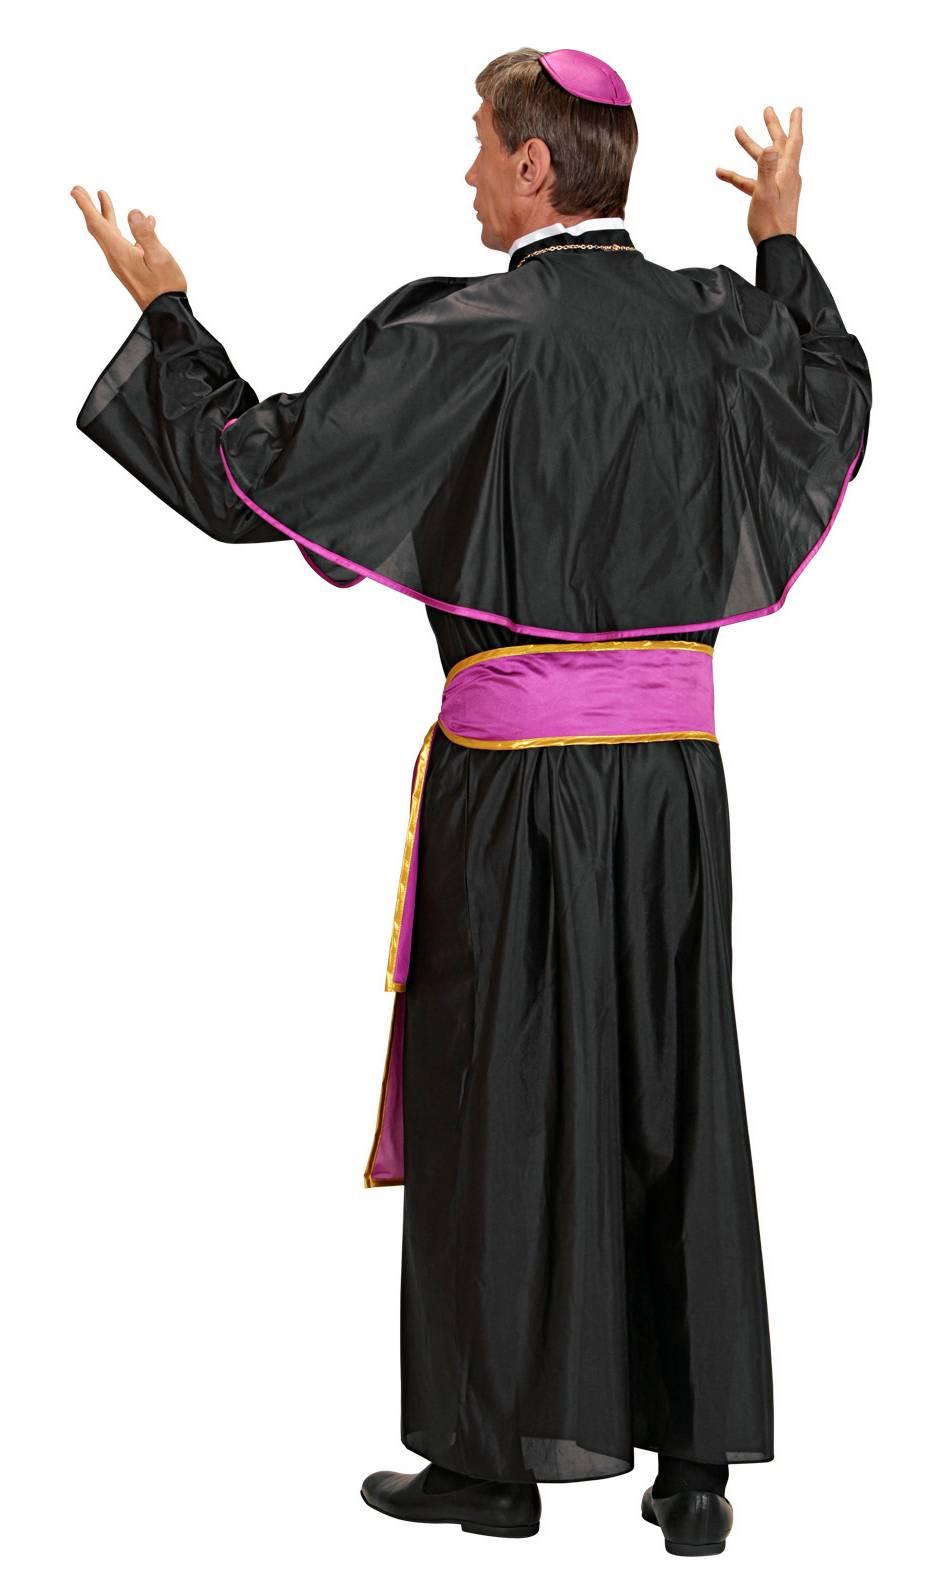 Costume-Cardinal-2